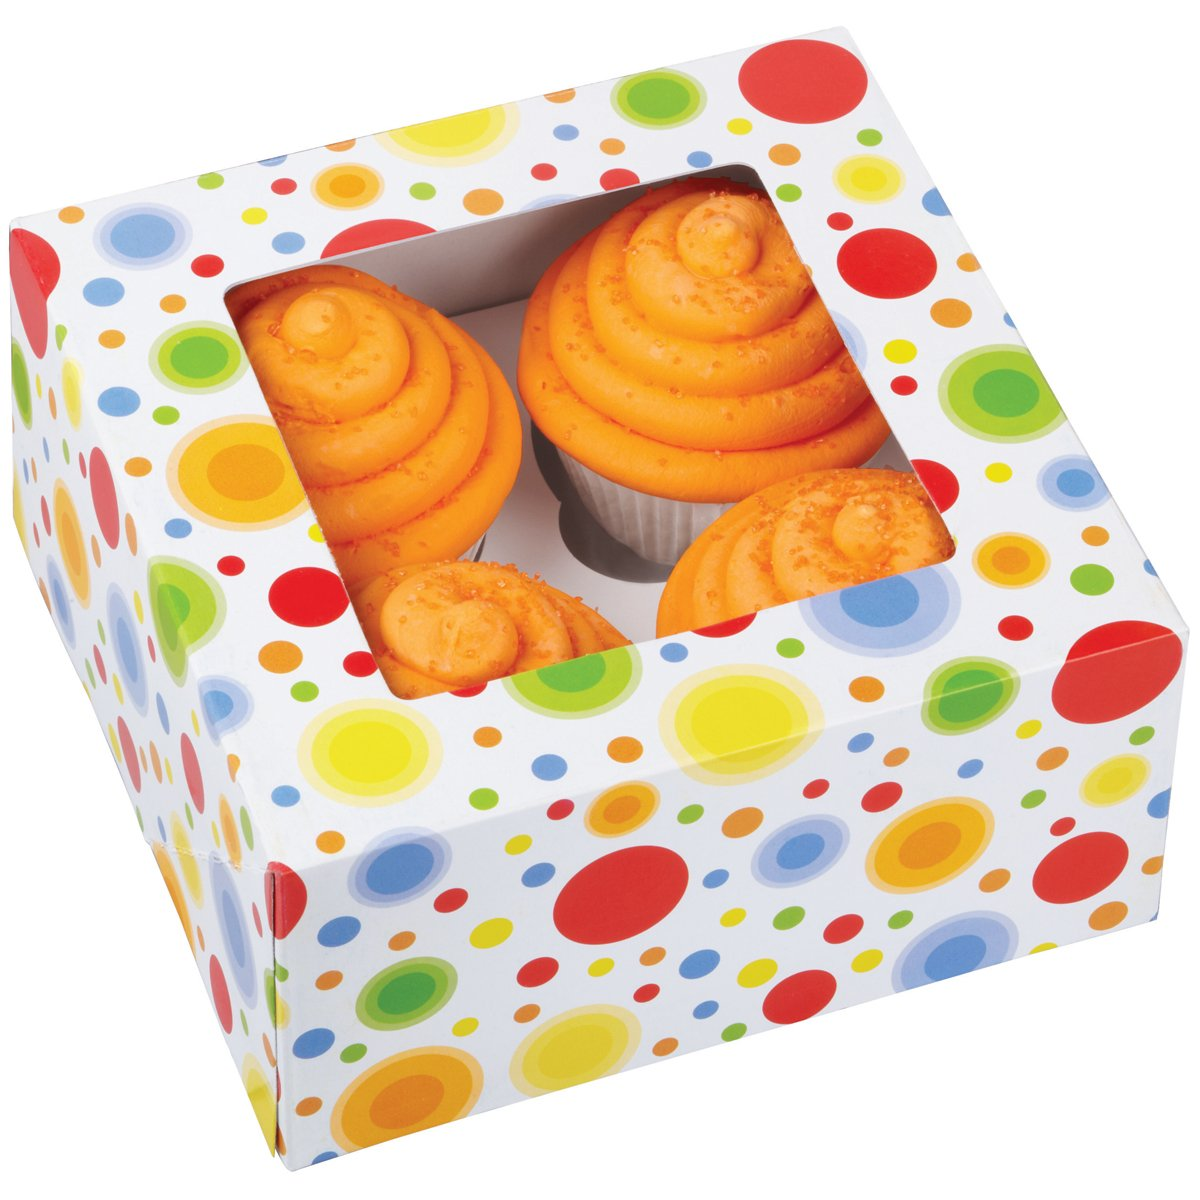 Wilton 4 Cavity Silver Cupcake Boxes, 3 Count 415-1359